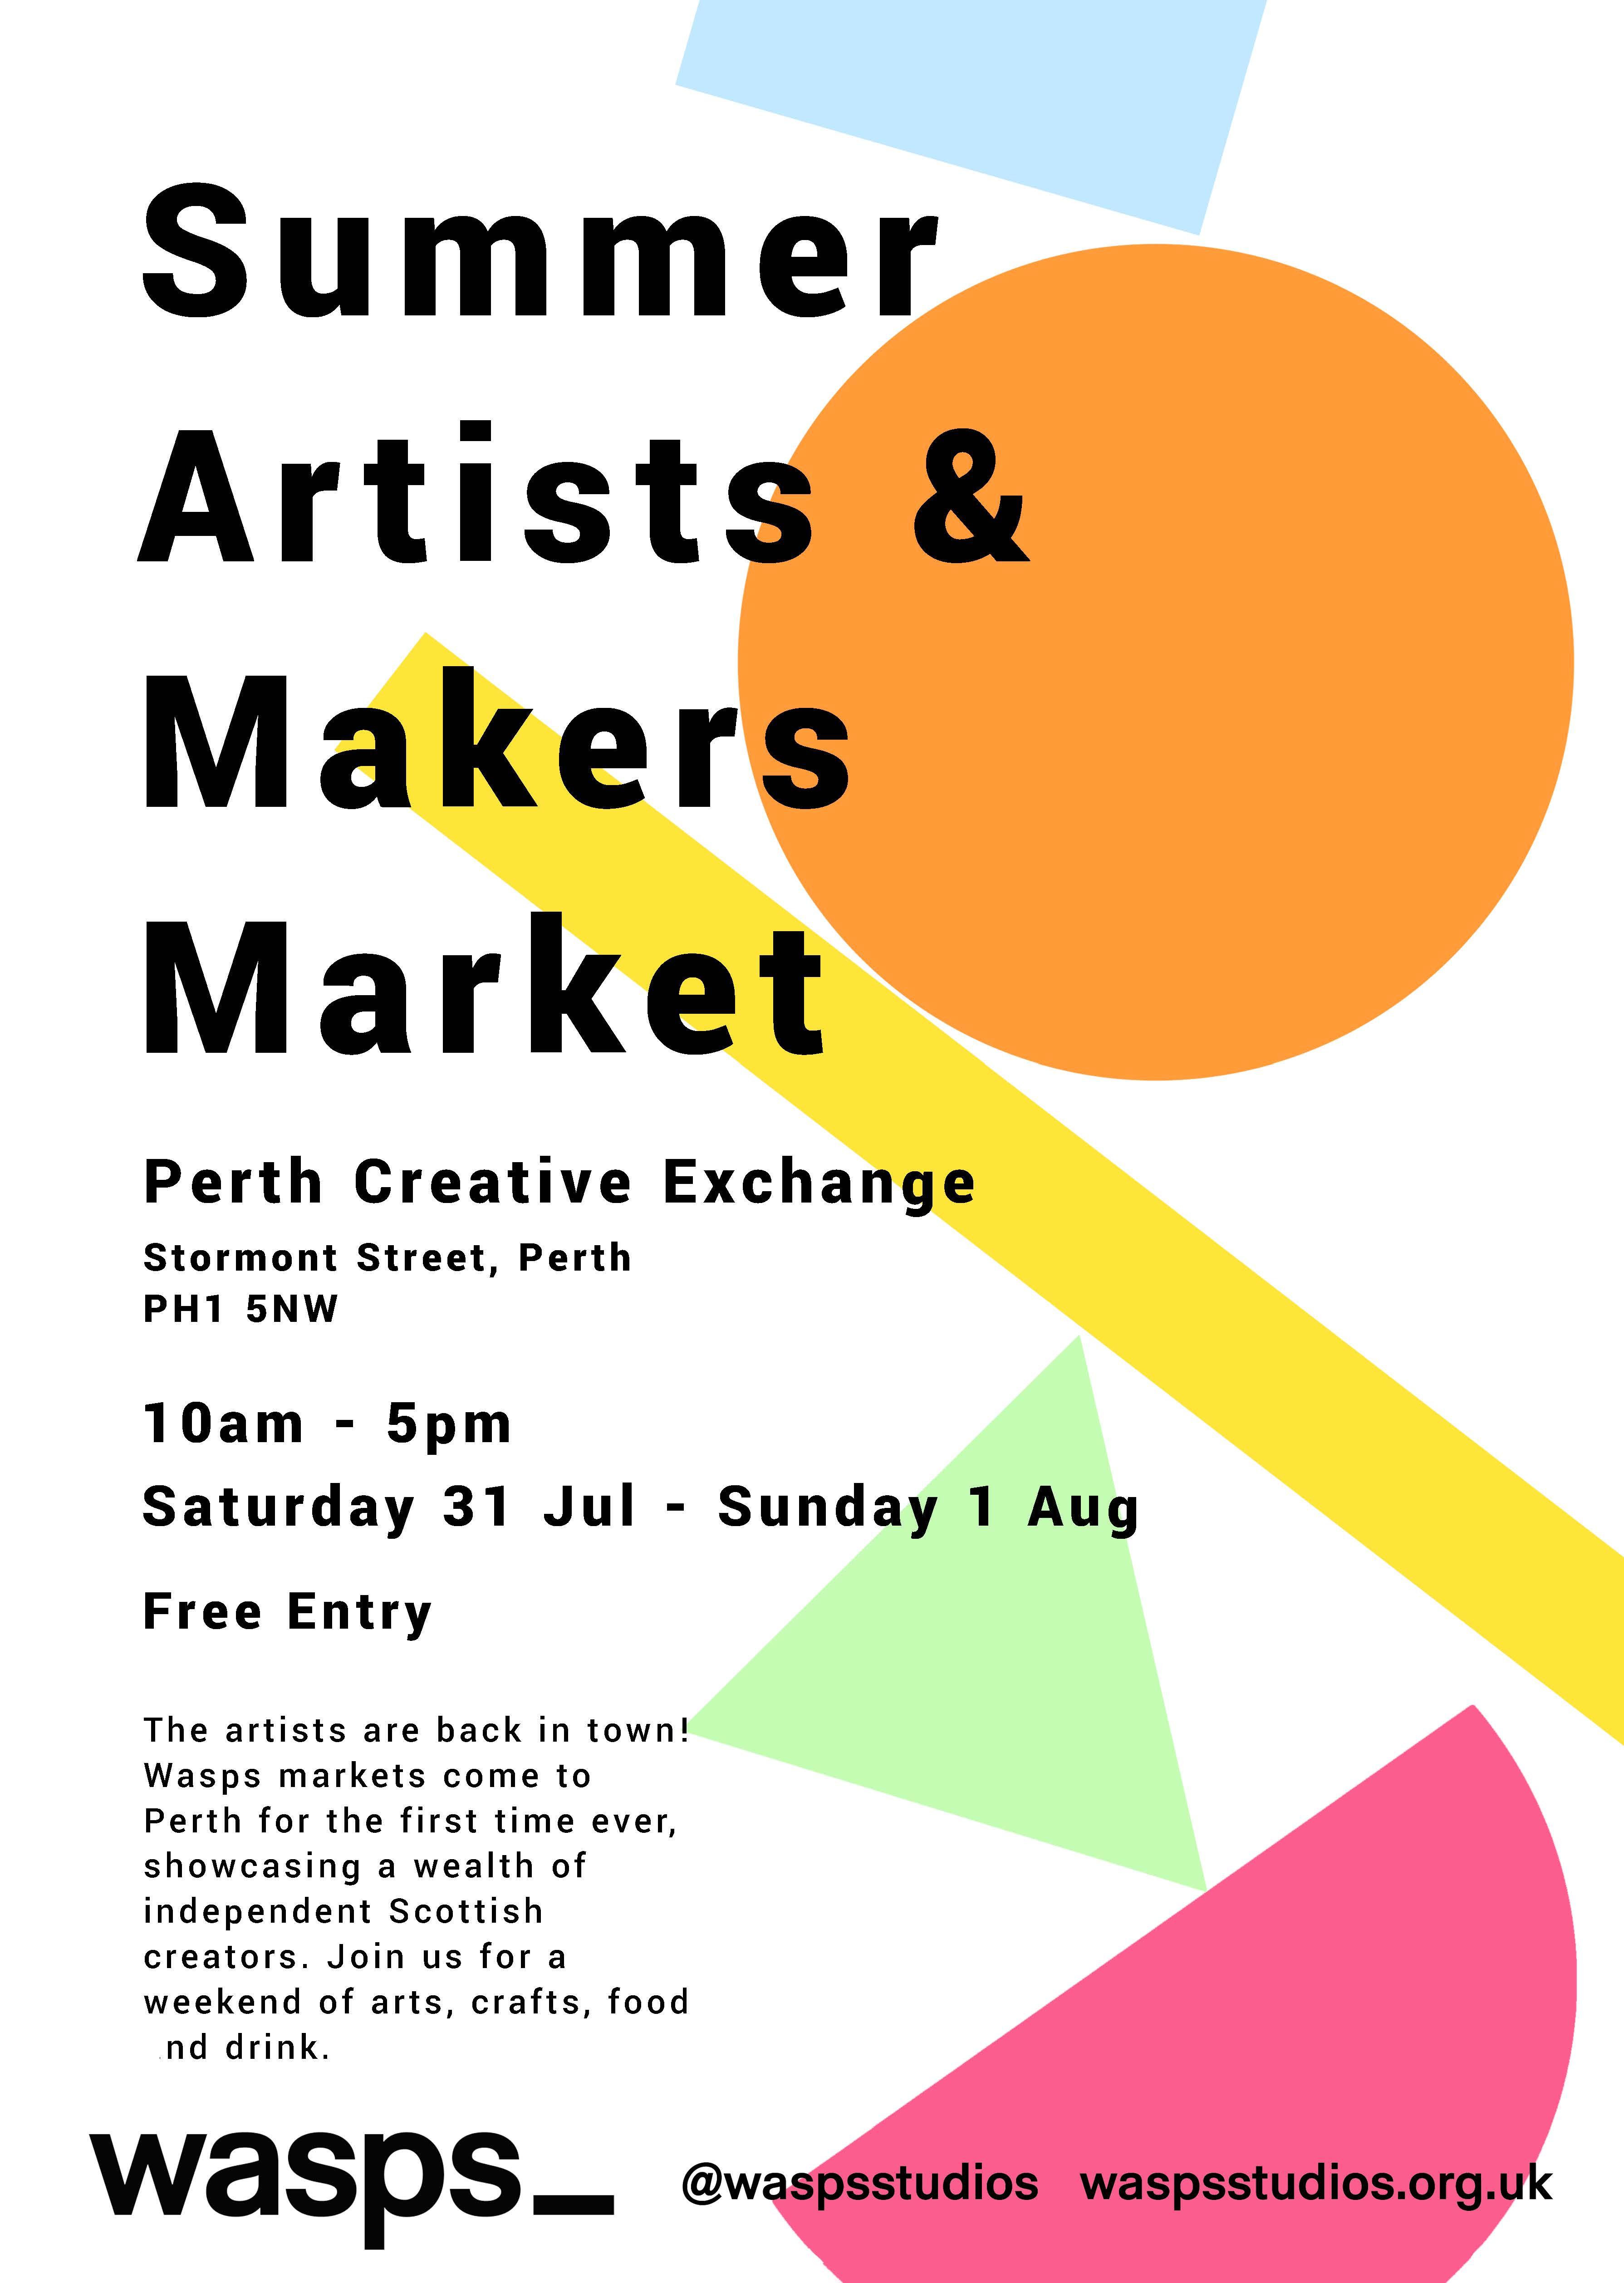 Wasps Summer Artists & Makers Market: Perth